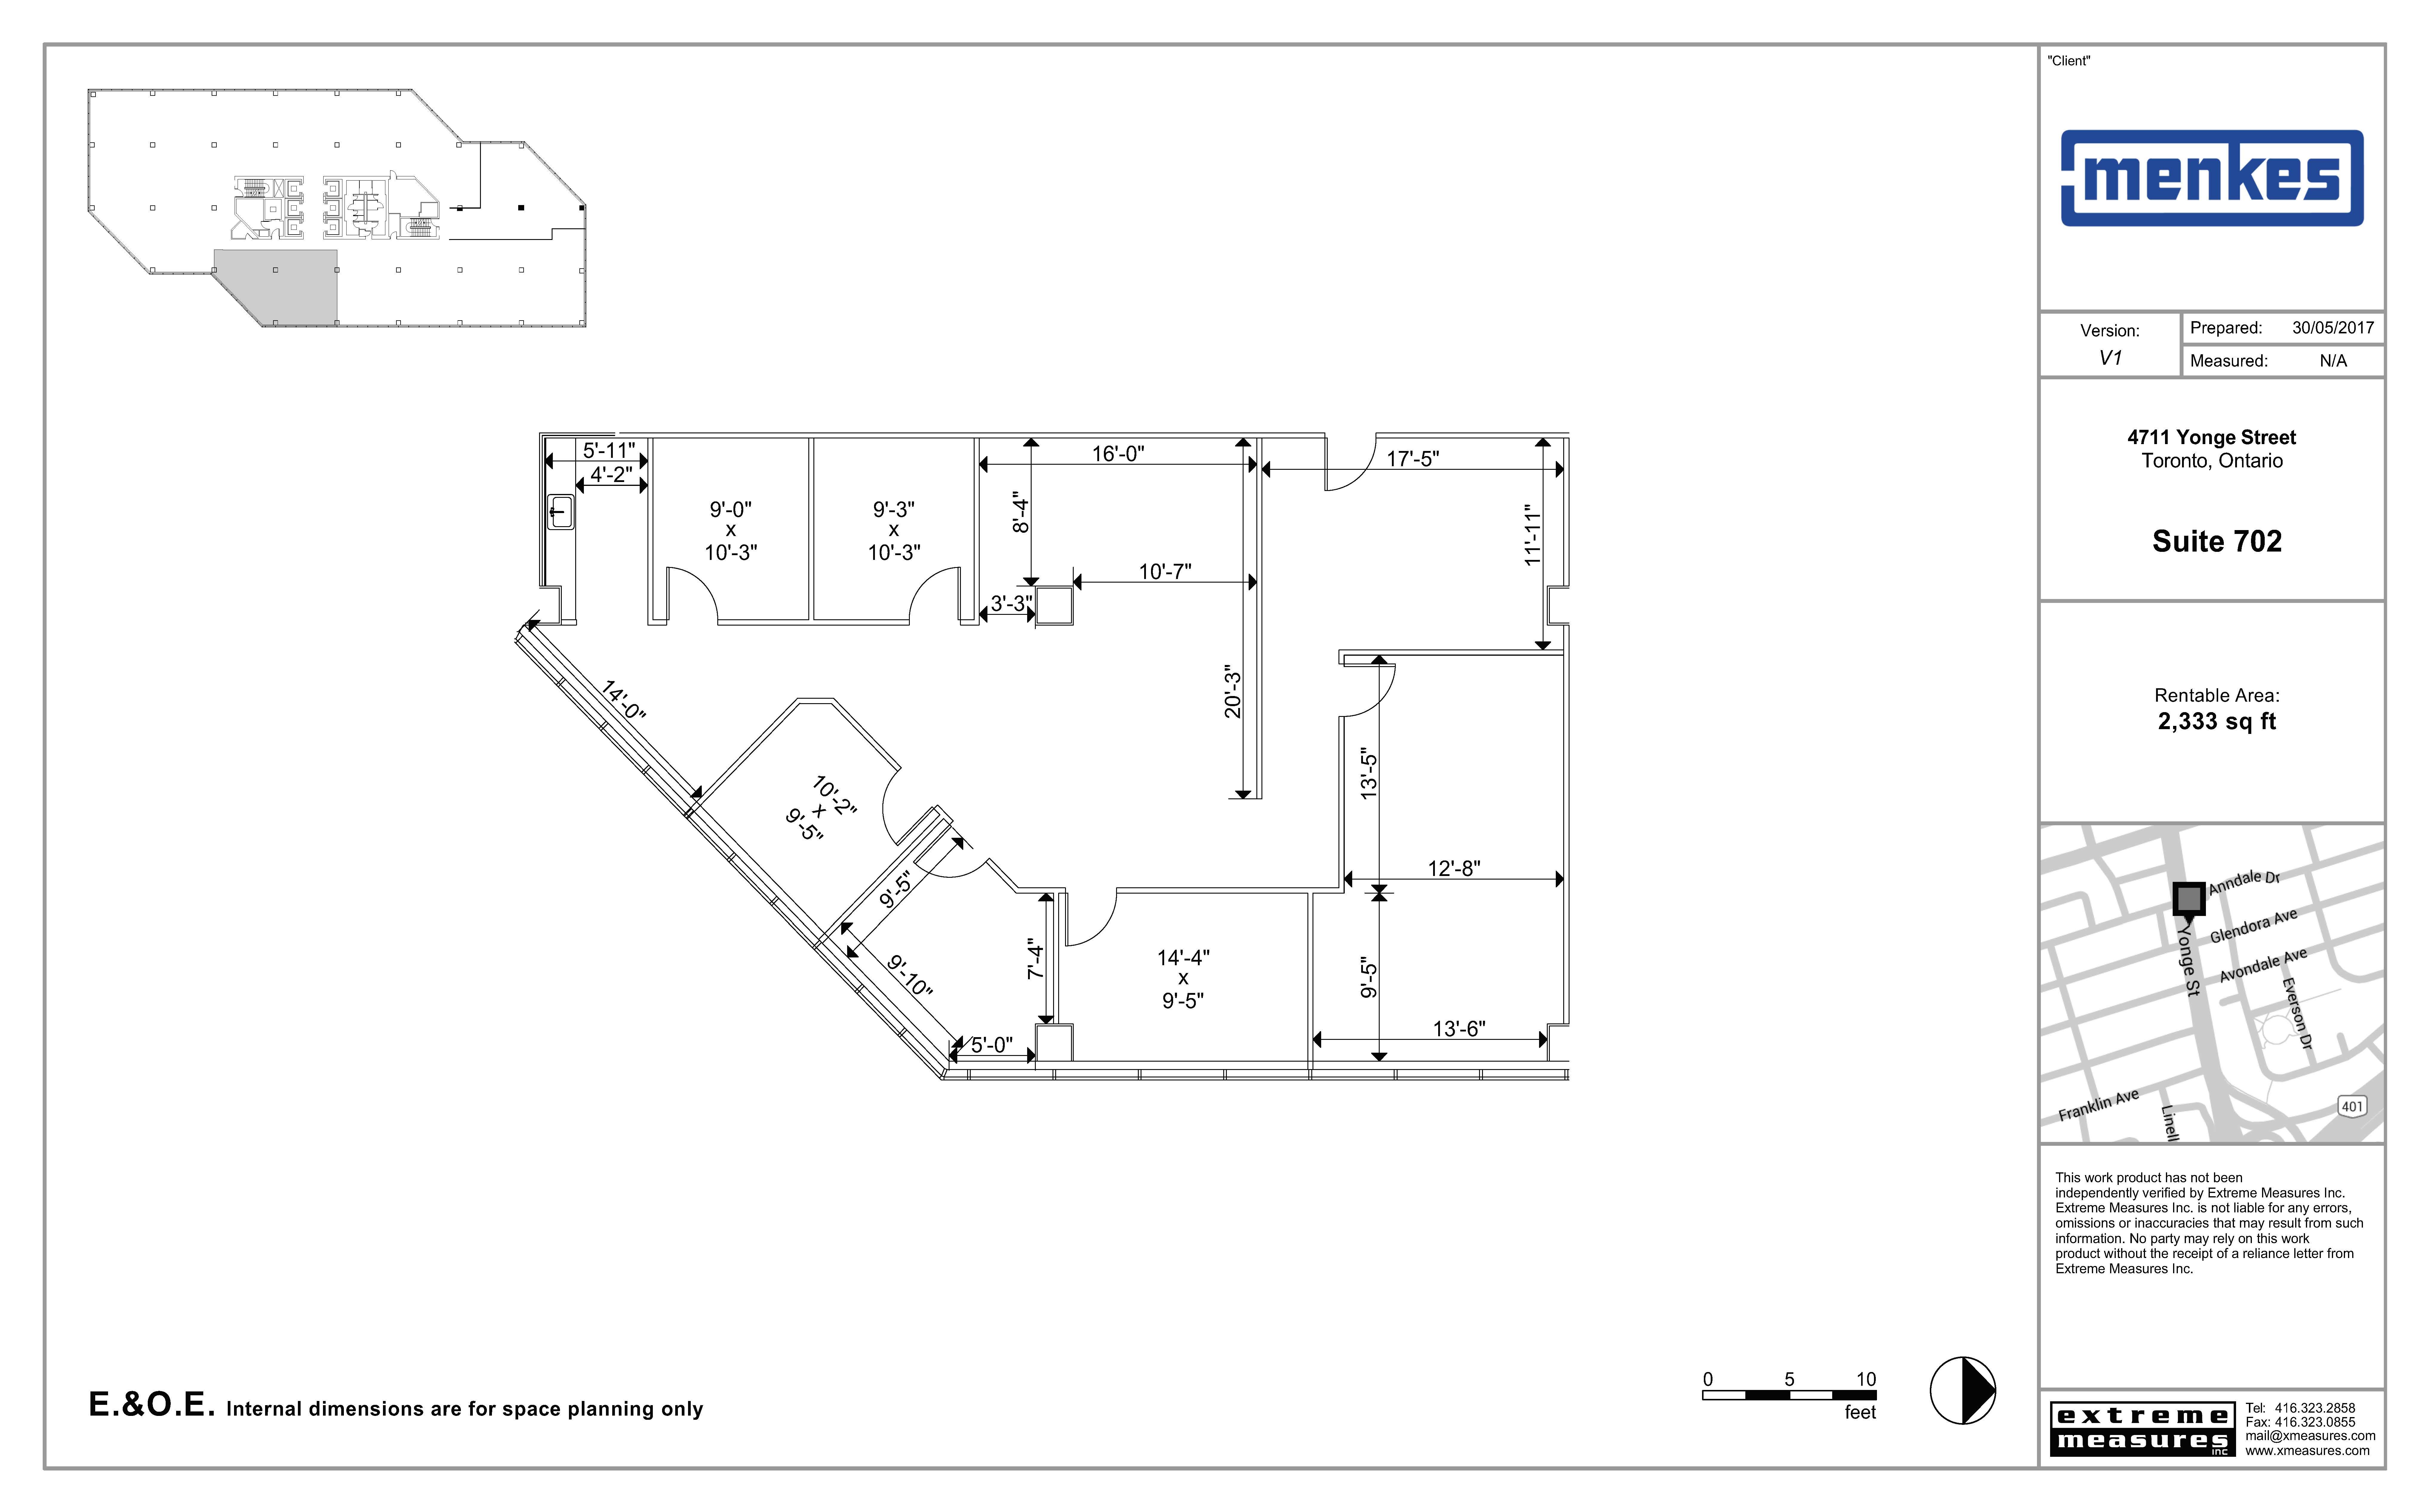 Floorplan thumbnail of suite 702